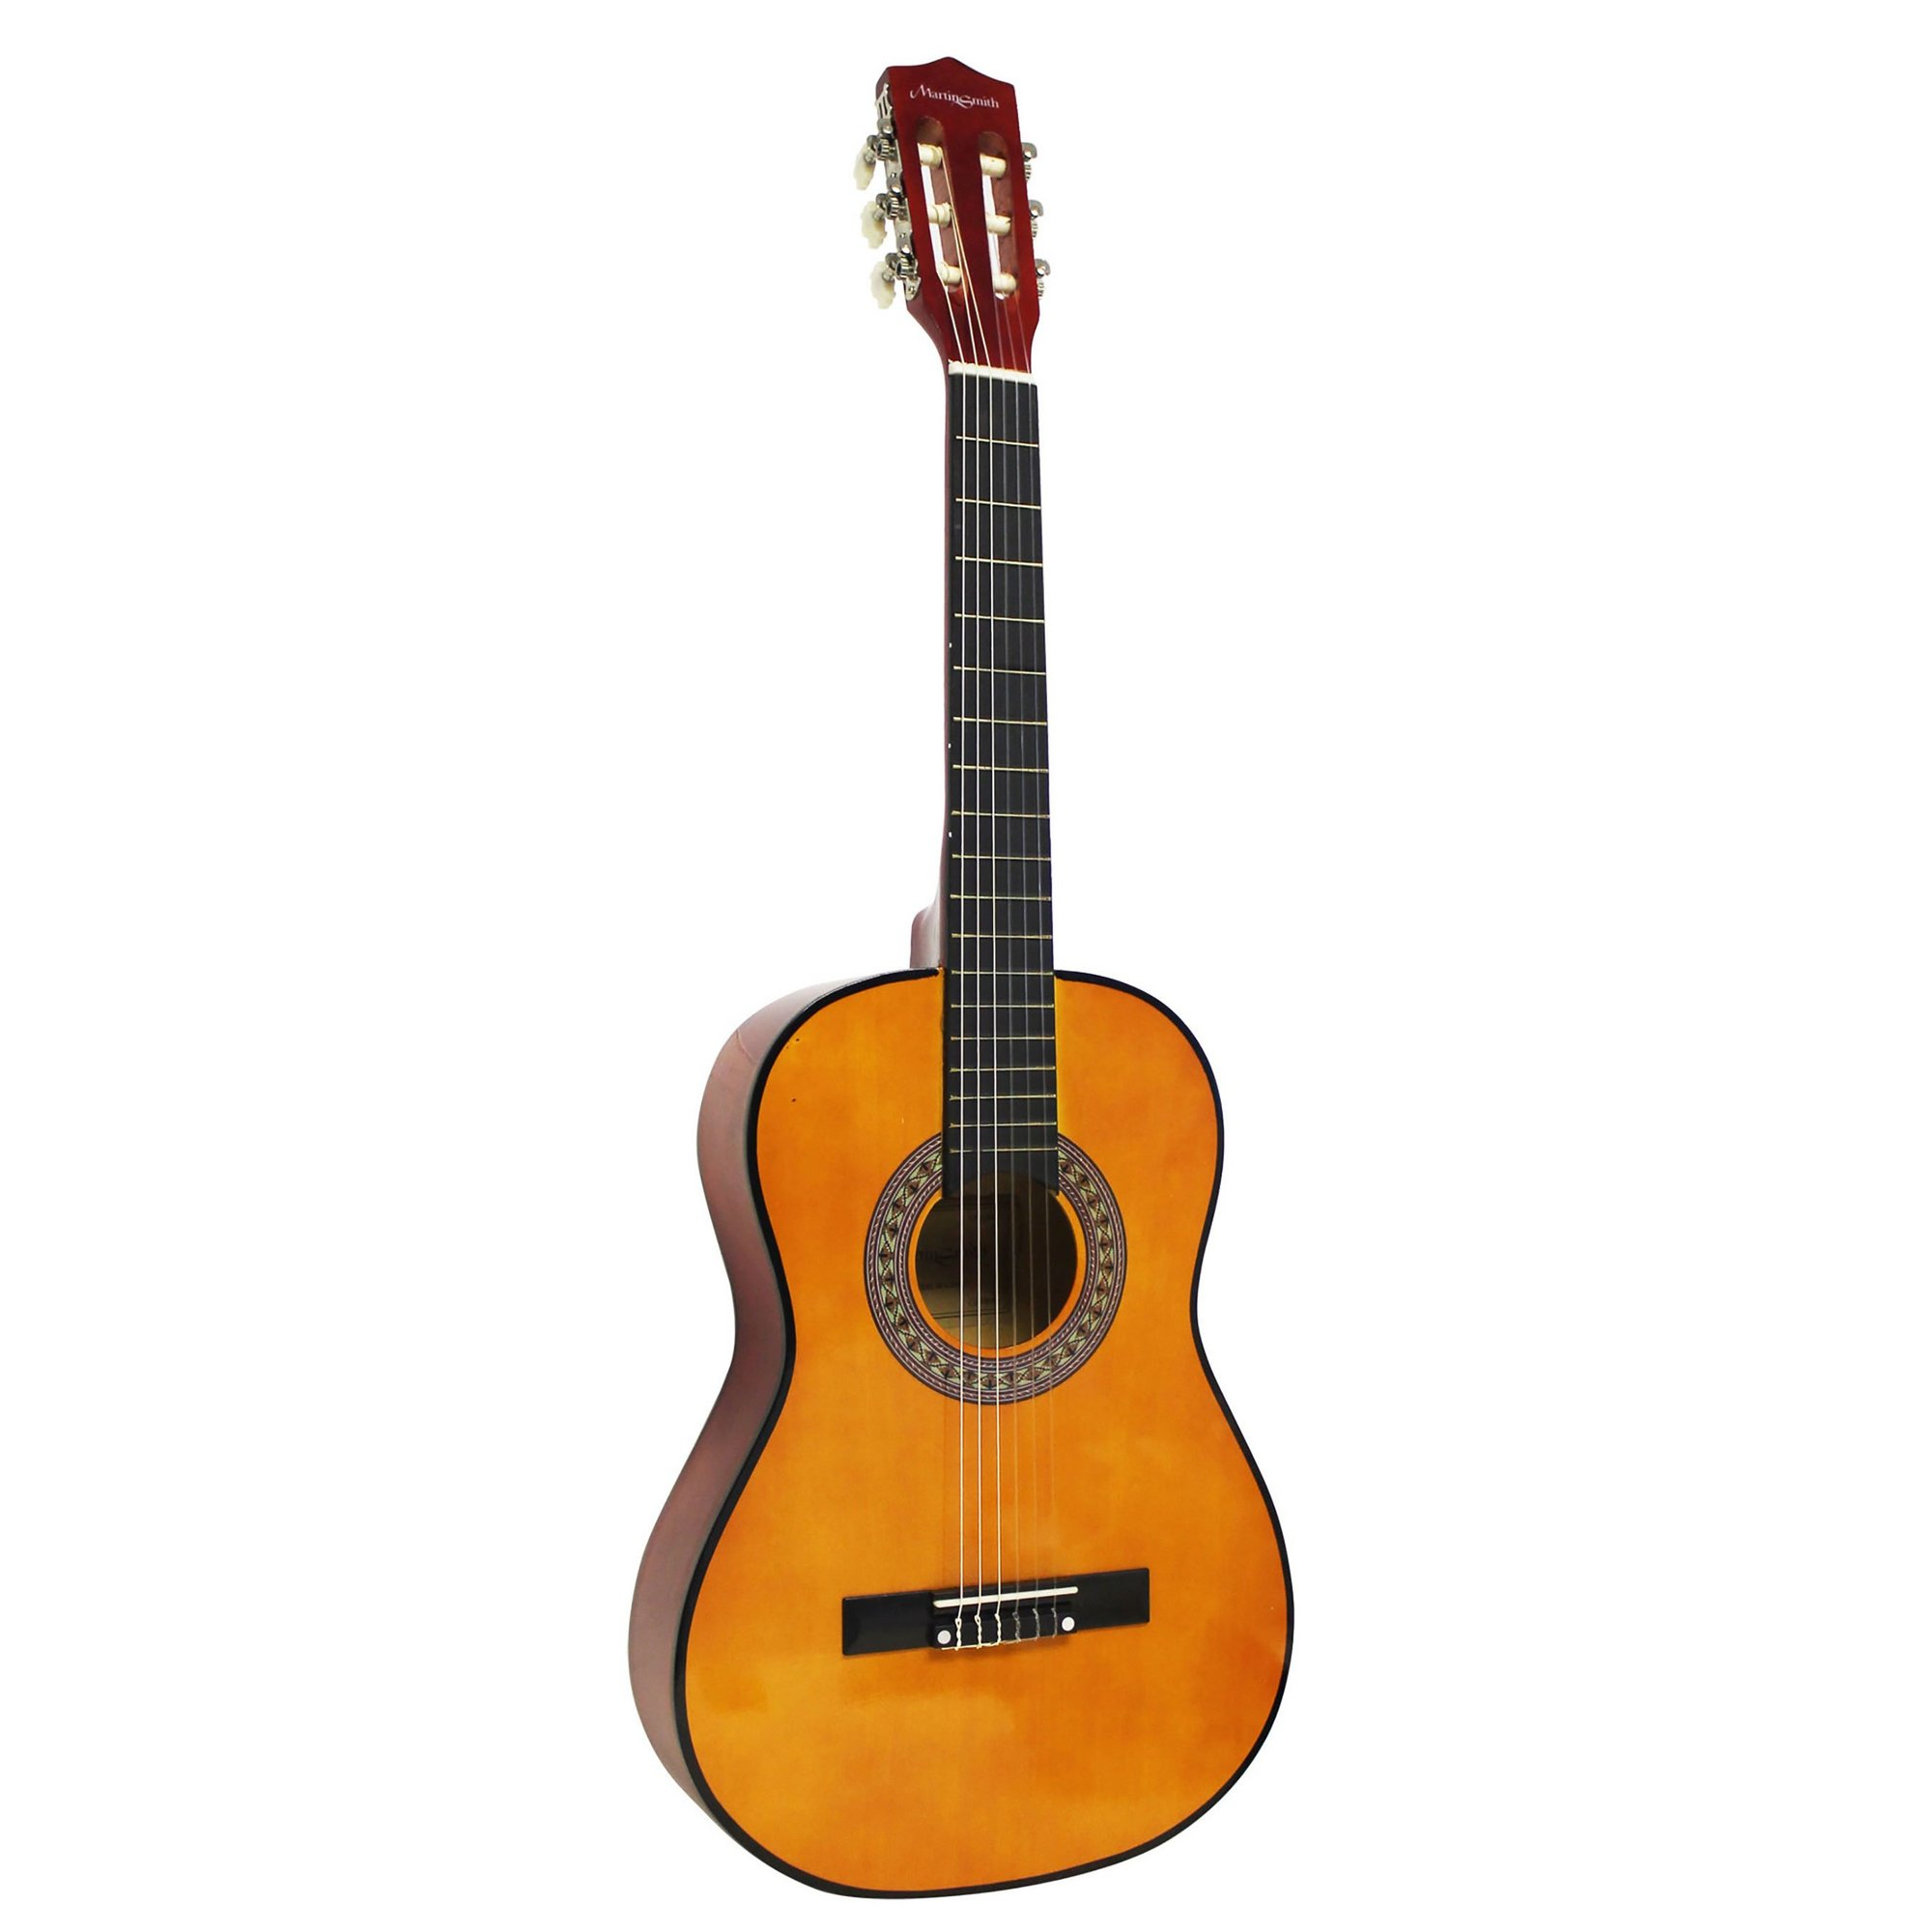 Image of Martin Smith 3/4 Guitar